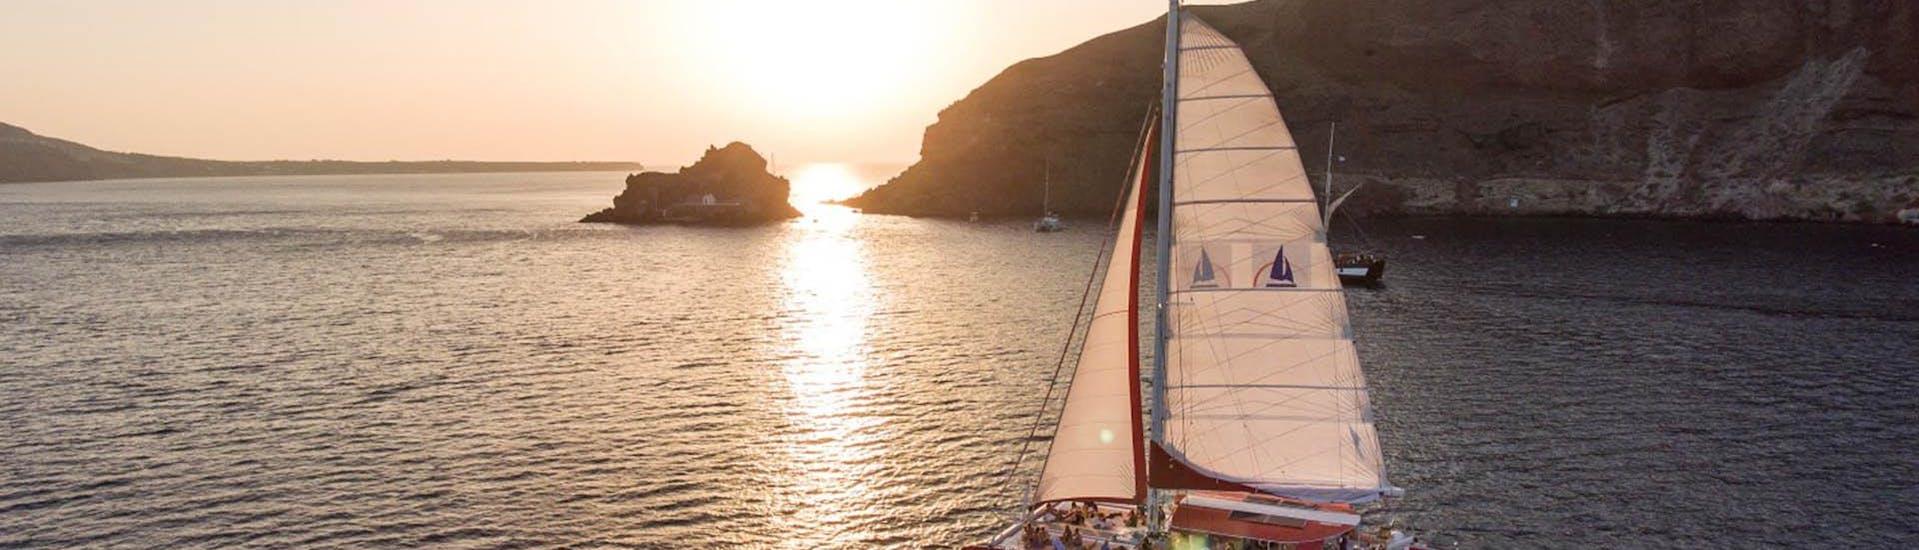 Catamaran Tour to the Red Beach at Sunset